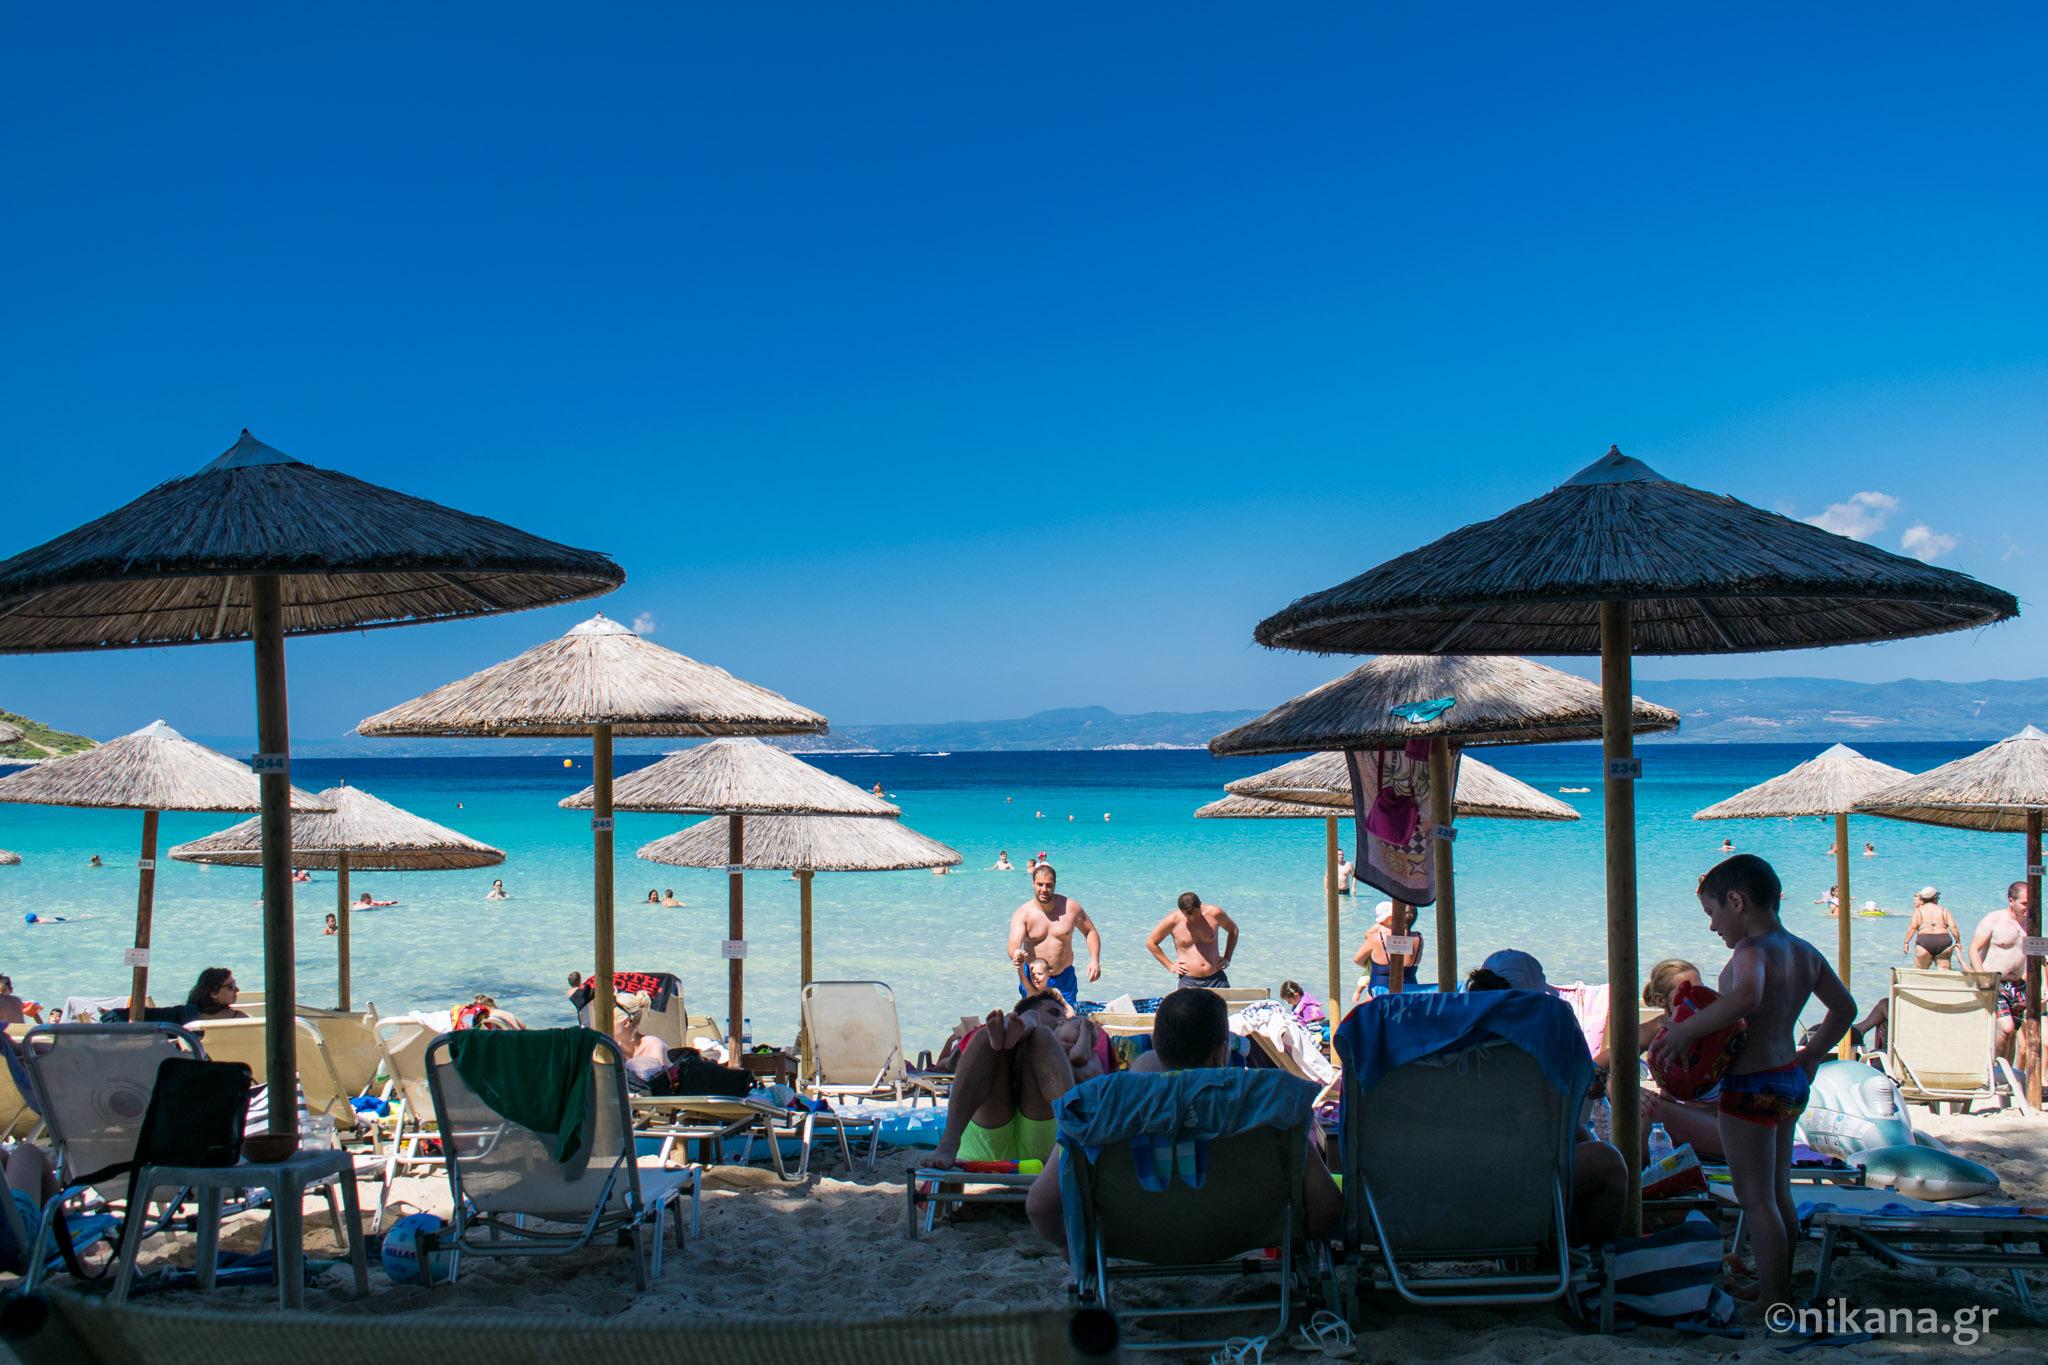 Chrousso bay and Xenia beach Kassandra tourist guide Nikanagr